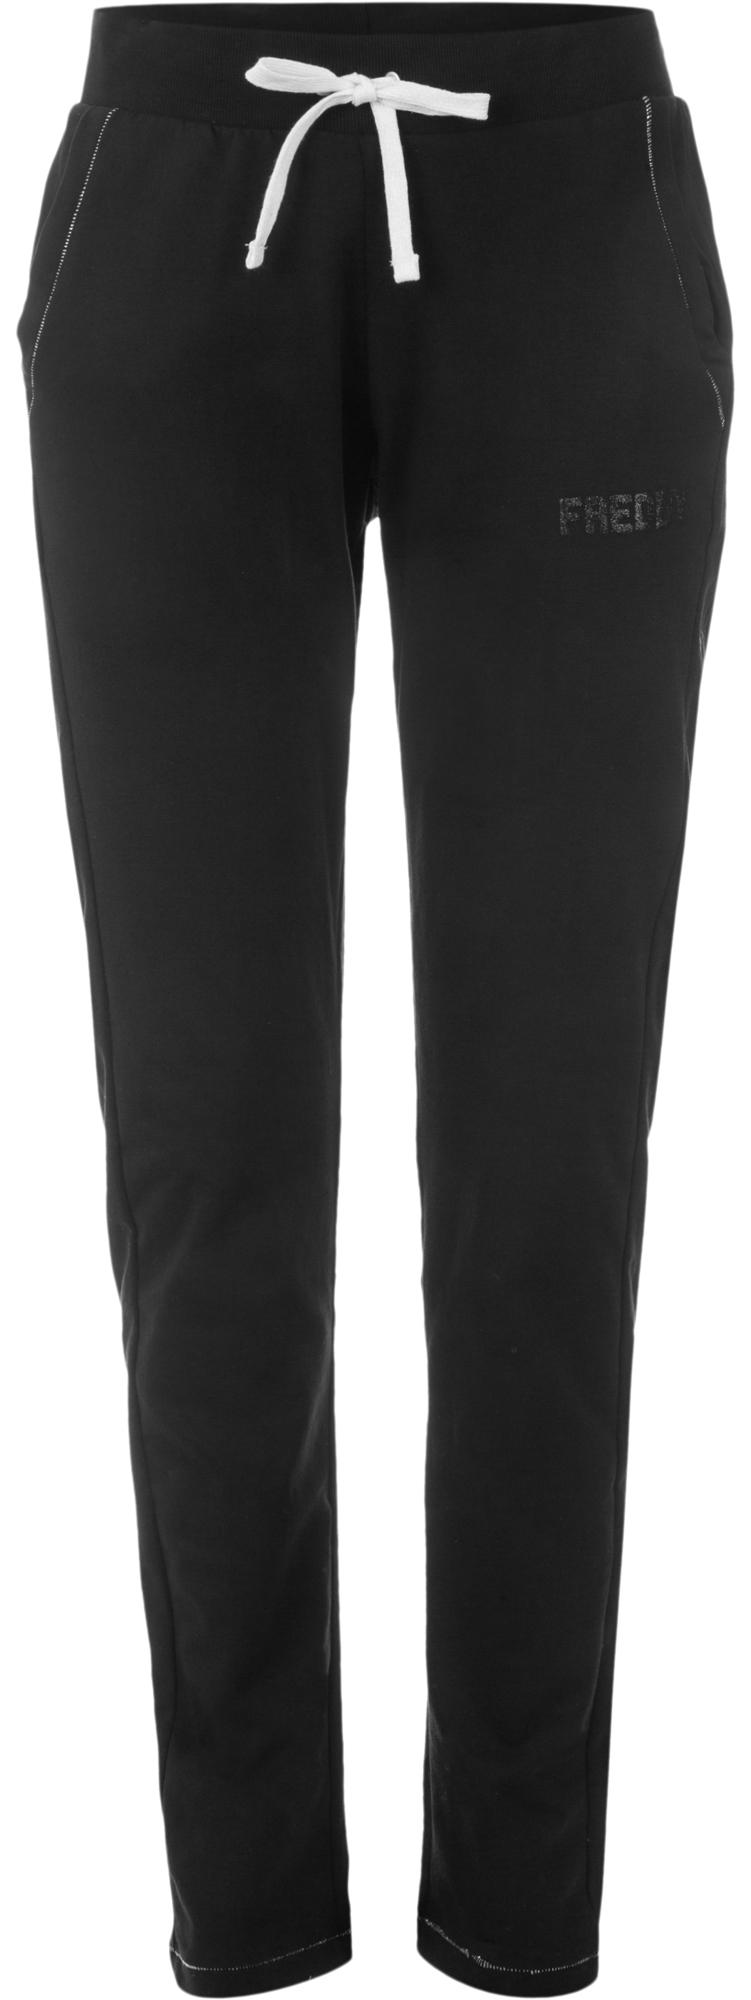 Freddy Брюки женские Freddy комплект брюки 7 8 и майка freddy